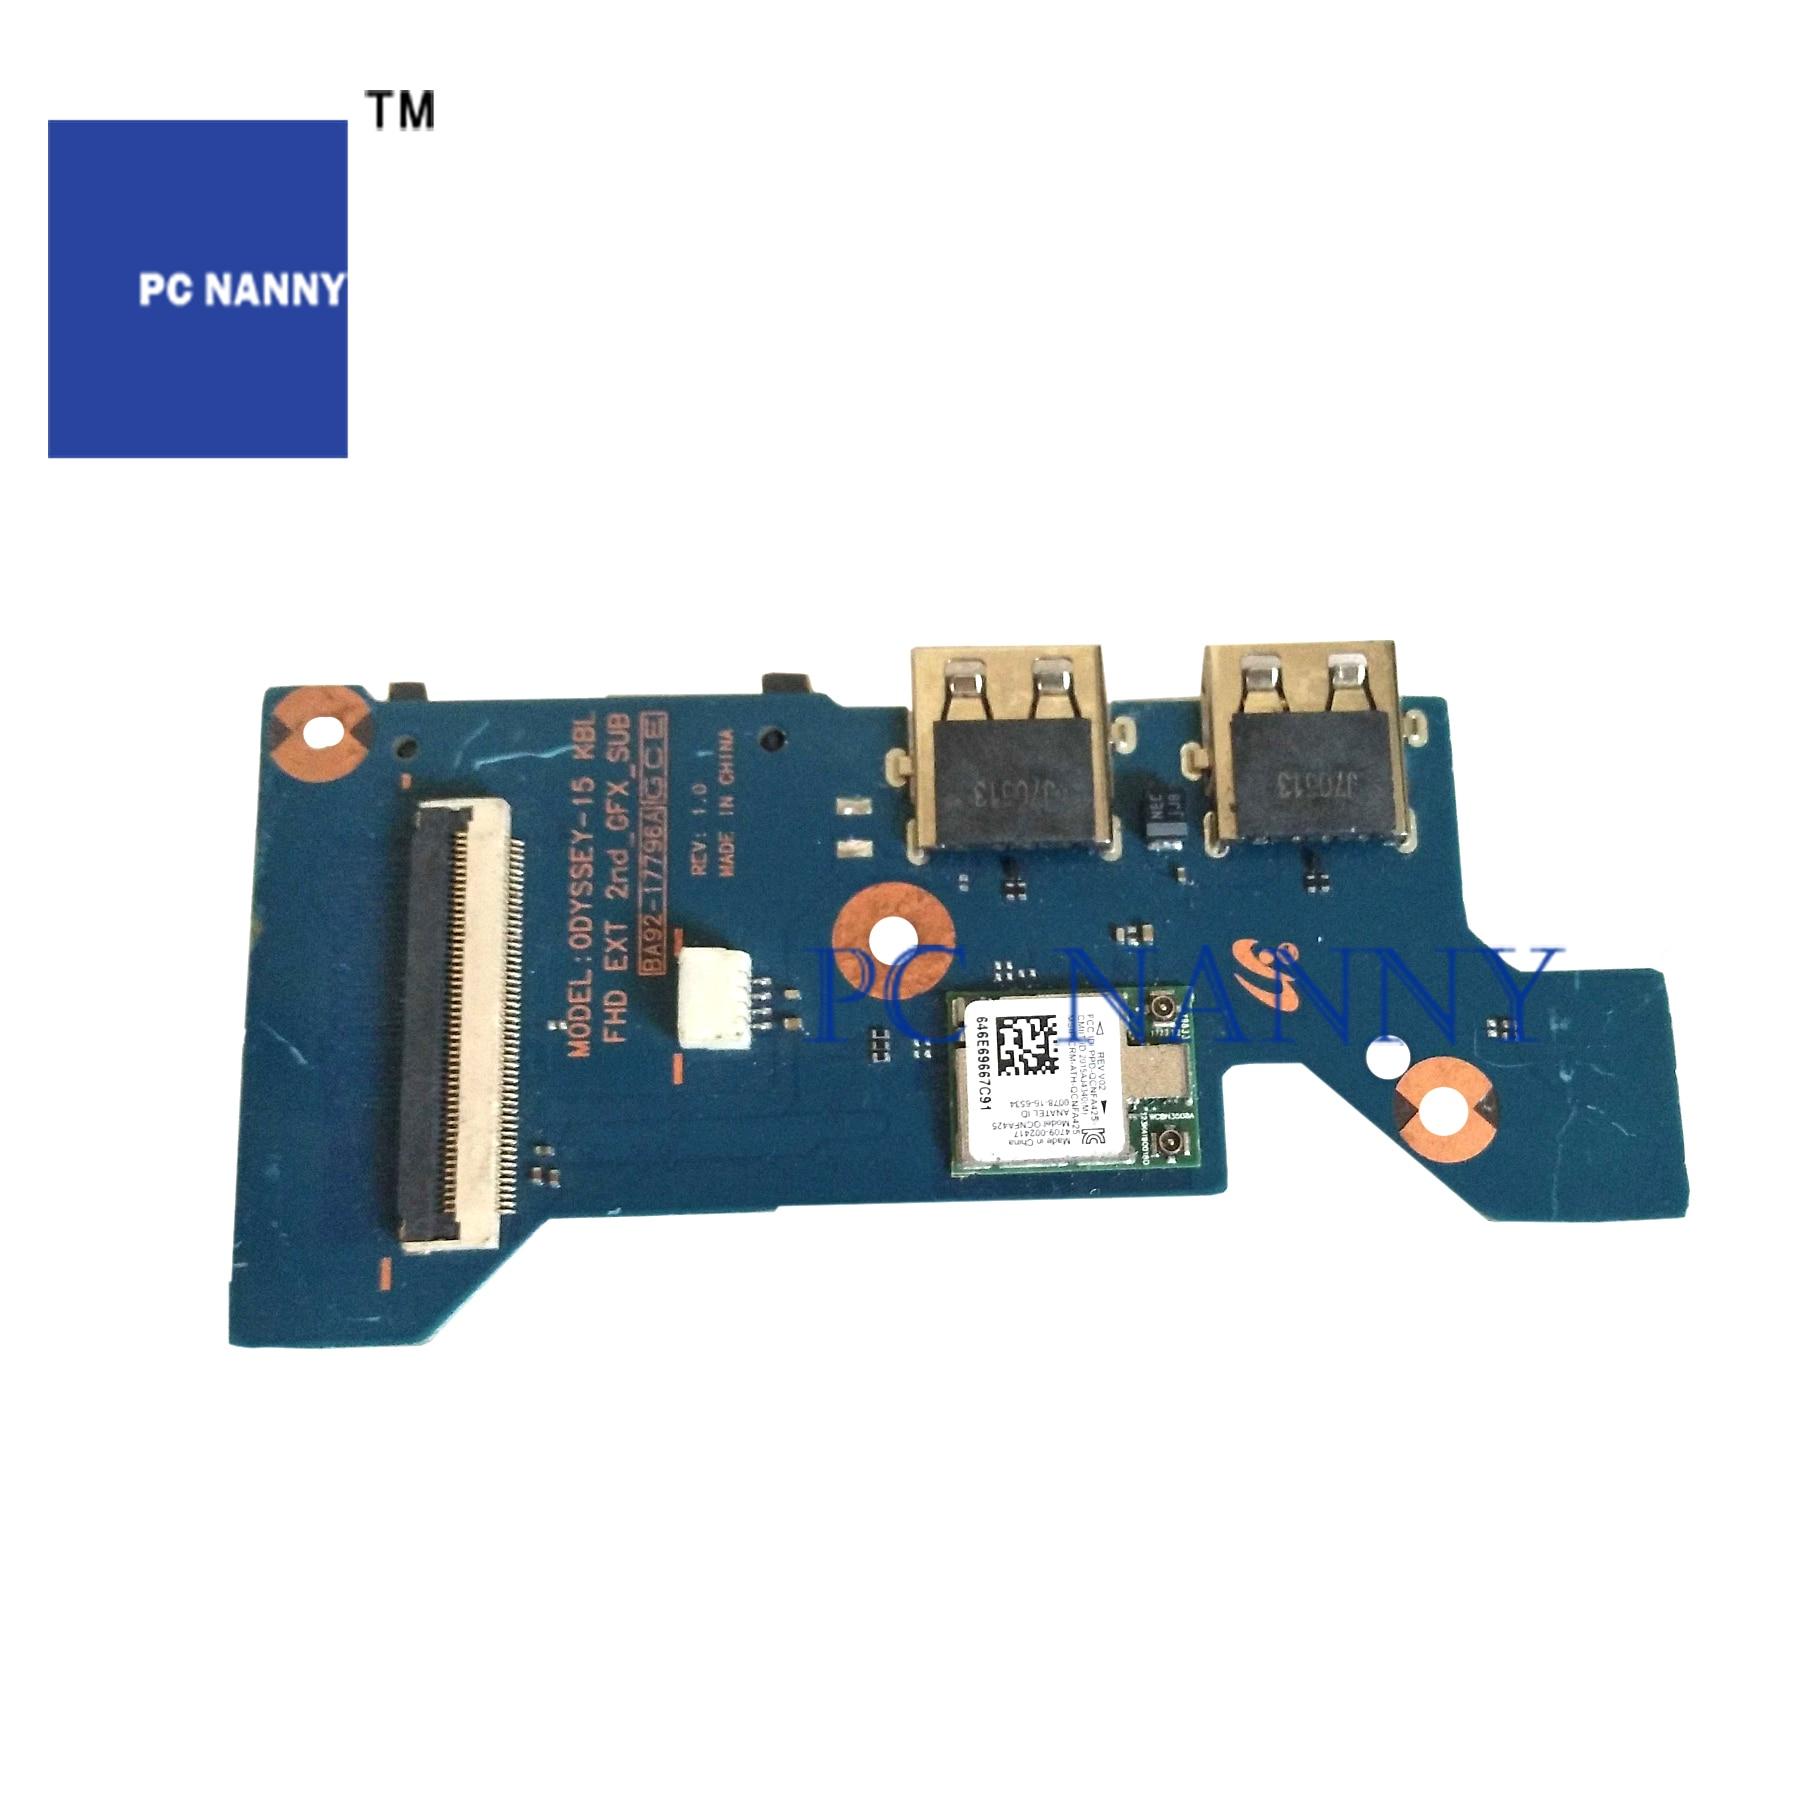 PCNANNY لسامسونج NP800G5H 800G5H USB SD الطاقة زر مجلس BA92-17796A اختبار جيدة